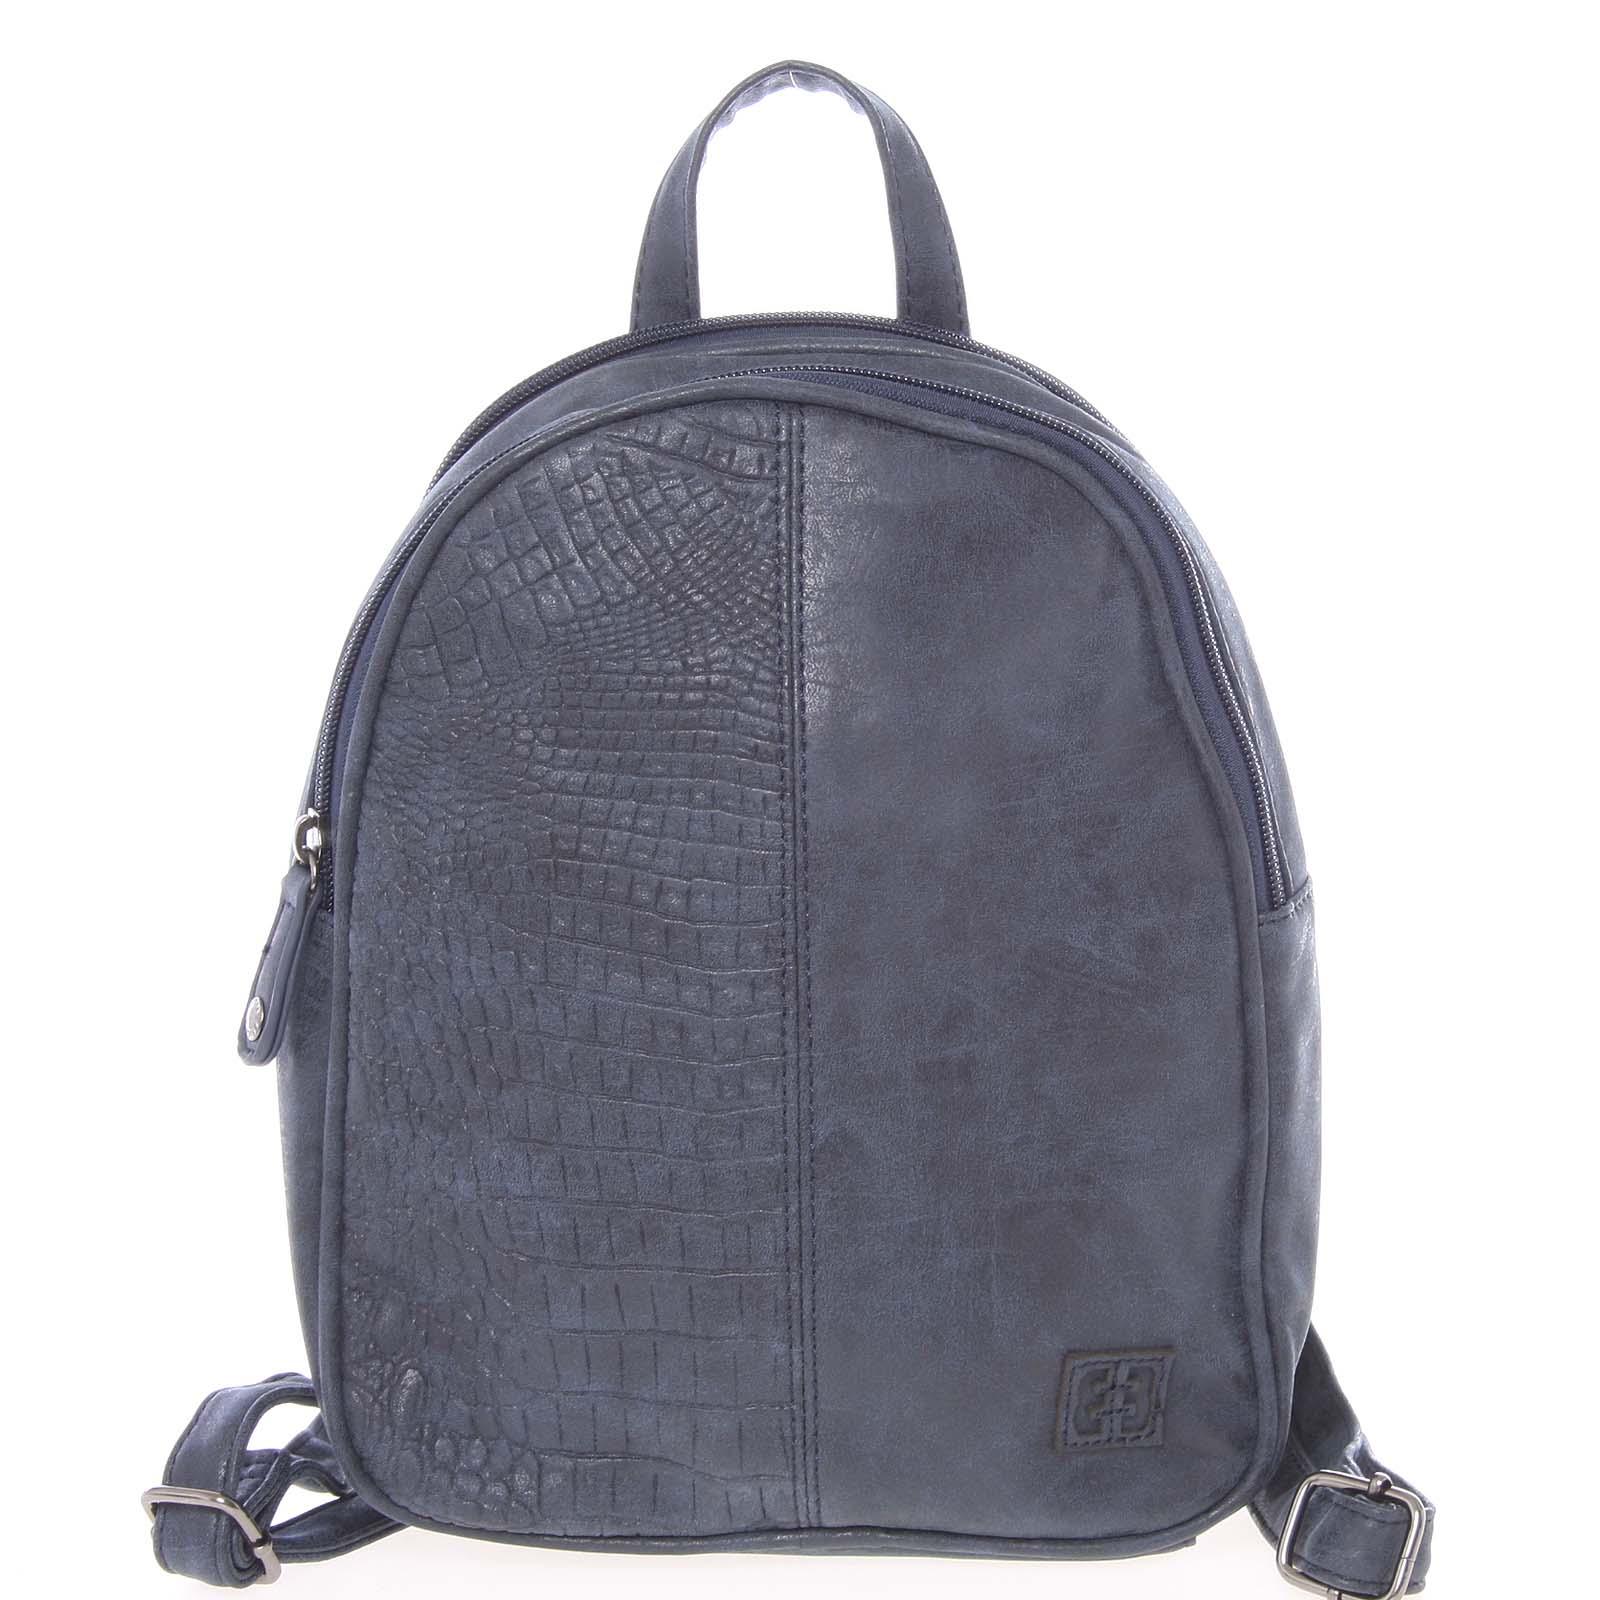 Malý stylový dámský batoh tmavě modrý - Enrico Benetti Abba